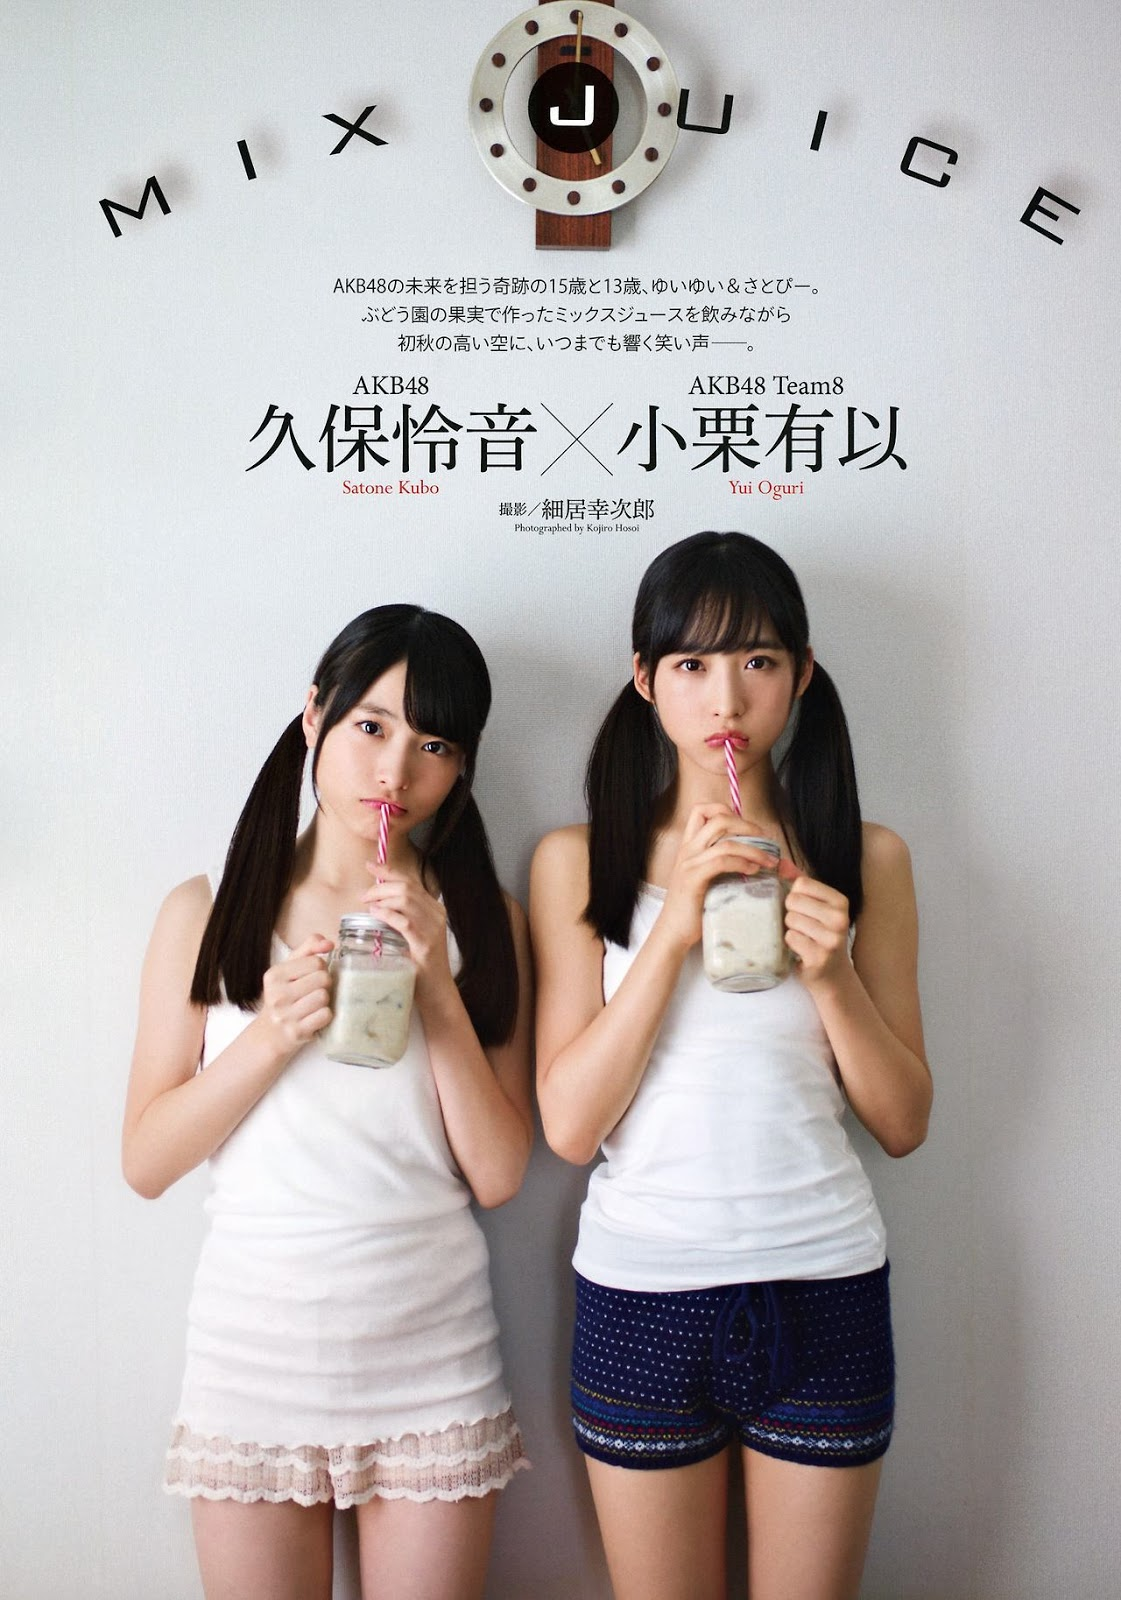 Oguri Yui 小栗有以, Kubo Satone 久保怜音, ENTAME 2017.11 (月刊エンタメ 2017年11月号)